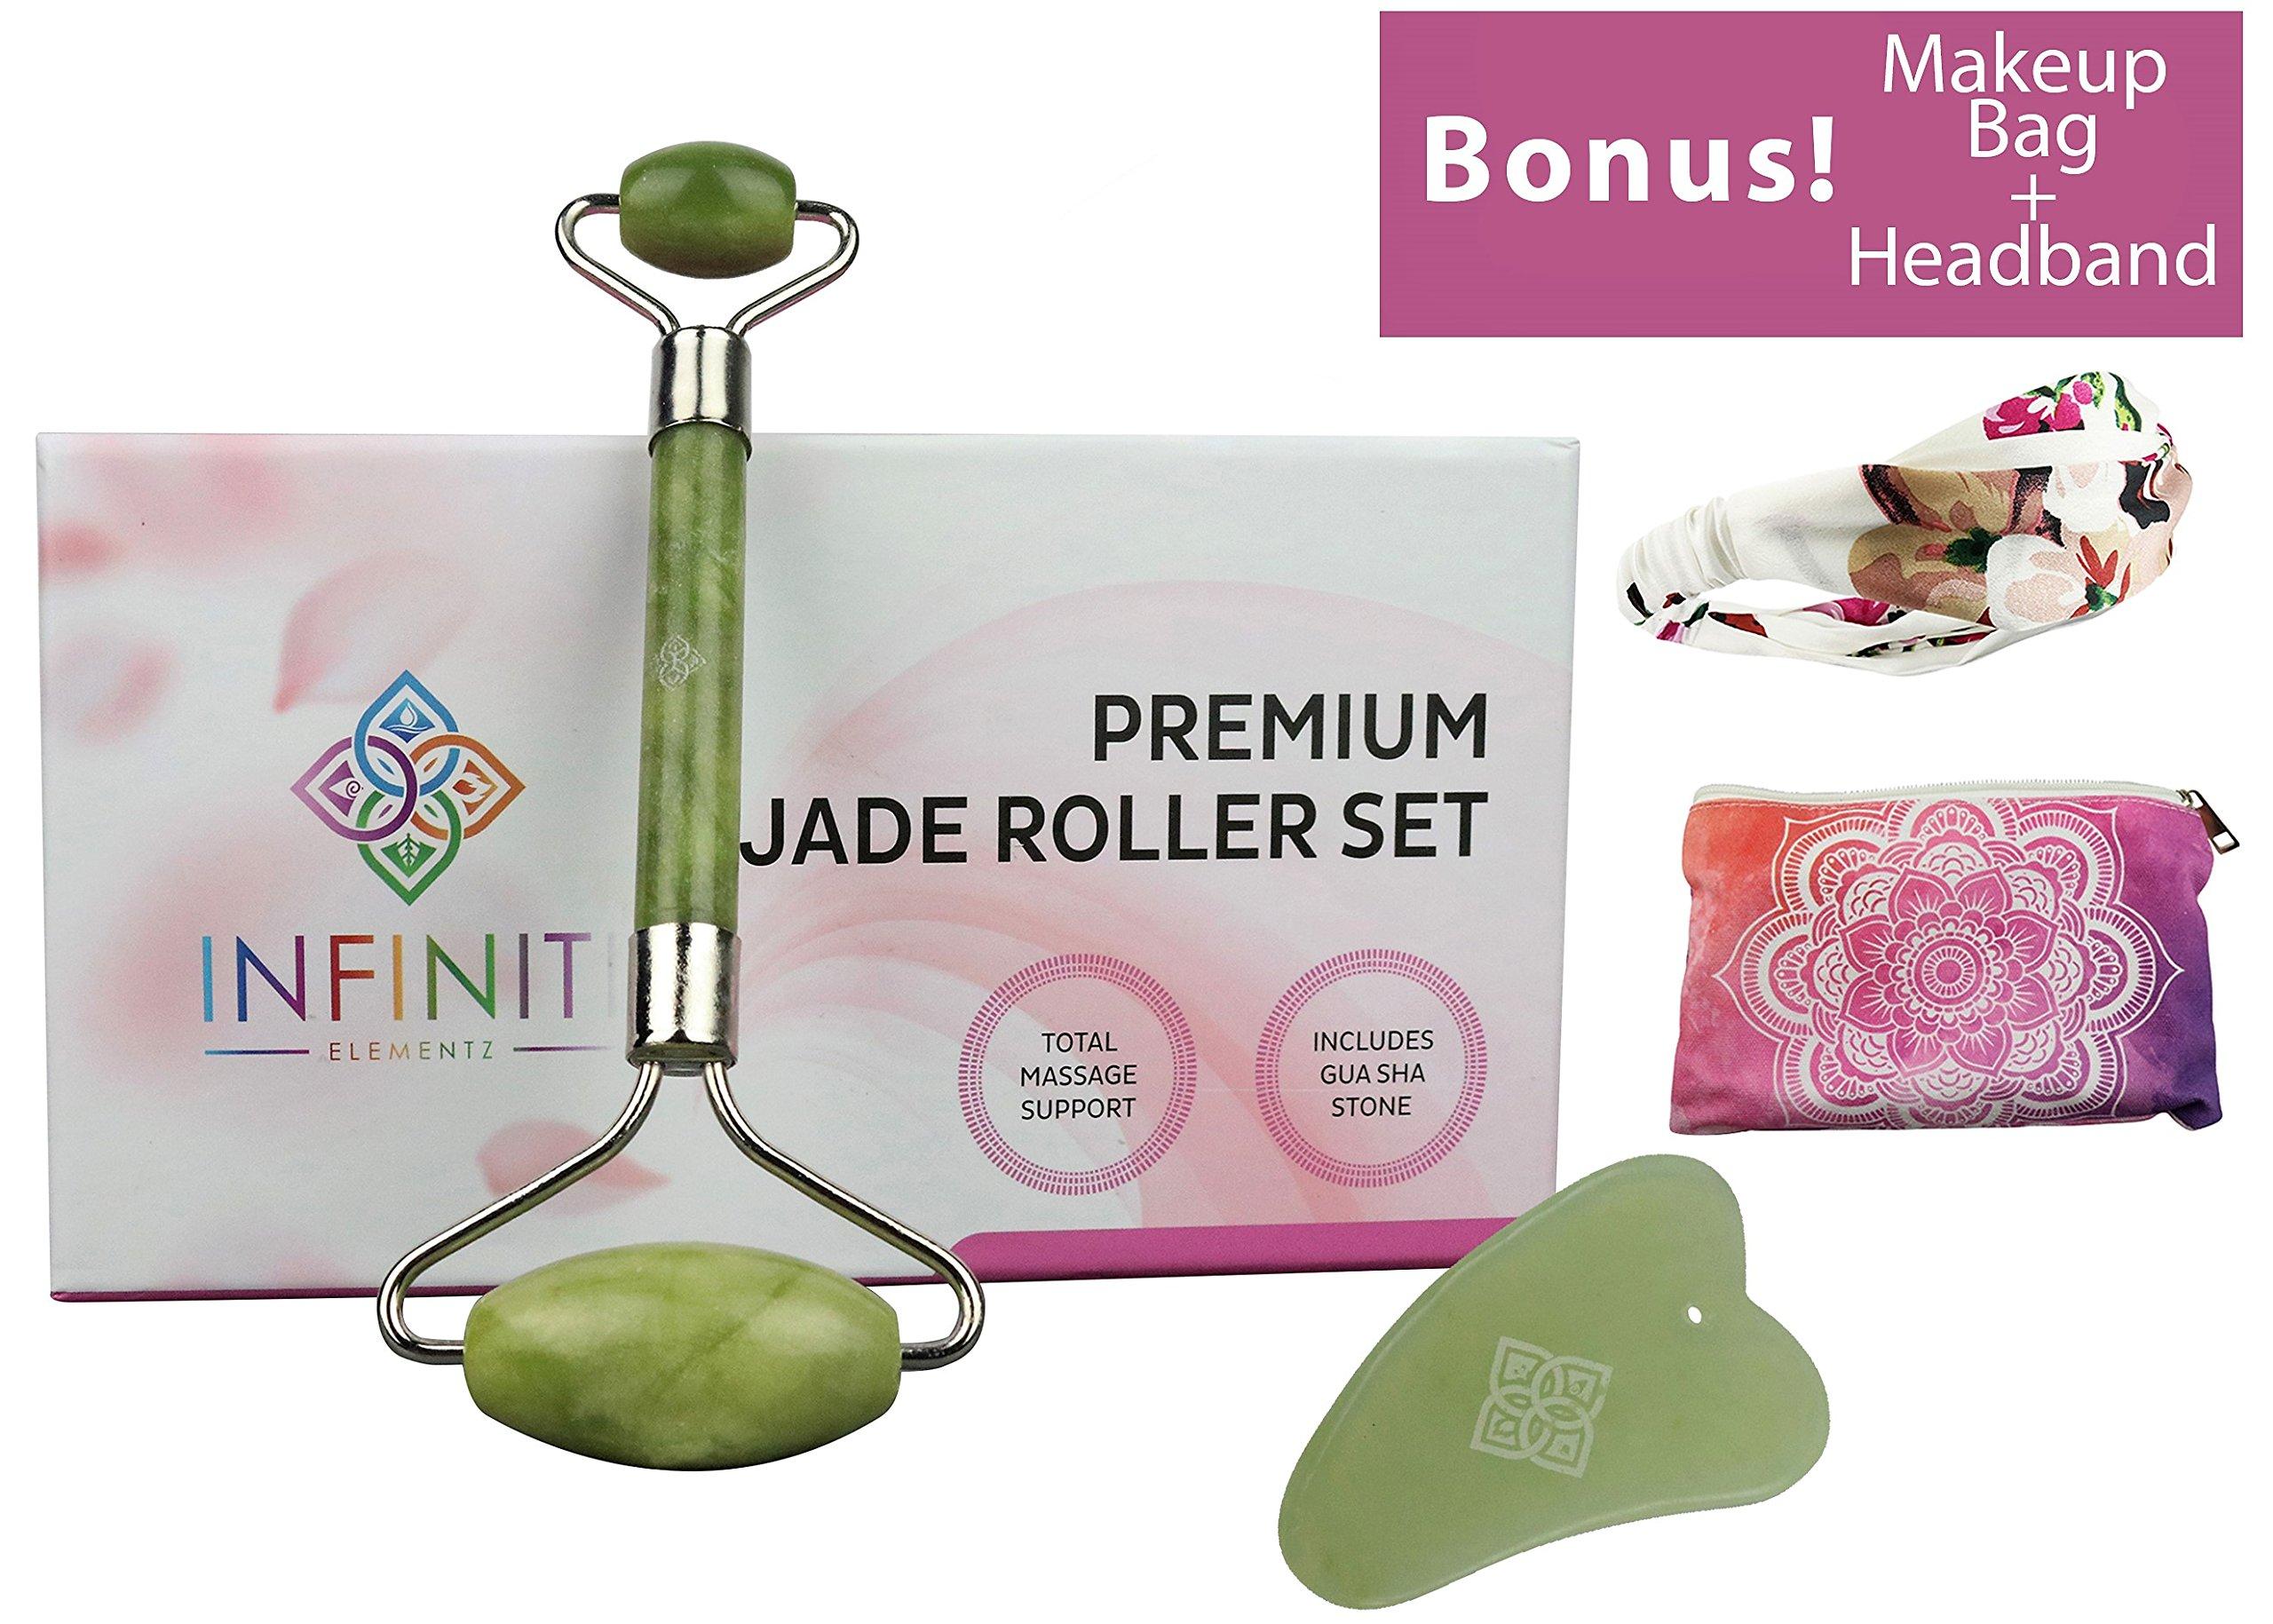 Premium Jade Massage Roller | Bonus!!! Gua Sha Stone, Makeup Bag & Headband | Natural, Spa-Quality Skincare and Derma Rolling | Stimulate Circulation, Chi, Collagen, Muscle Relief By infiniti elementz